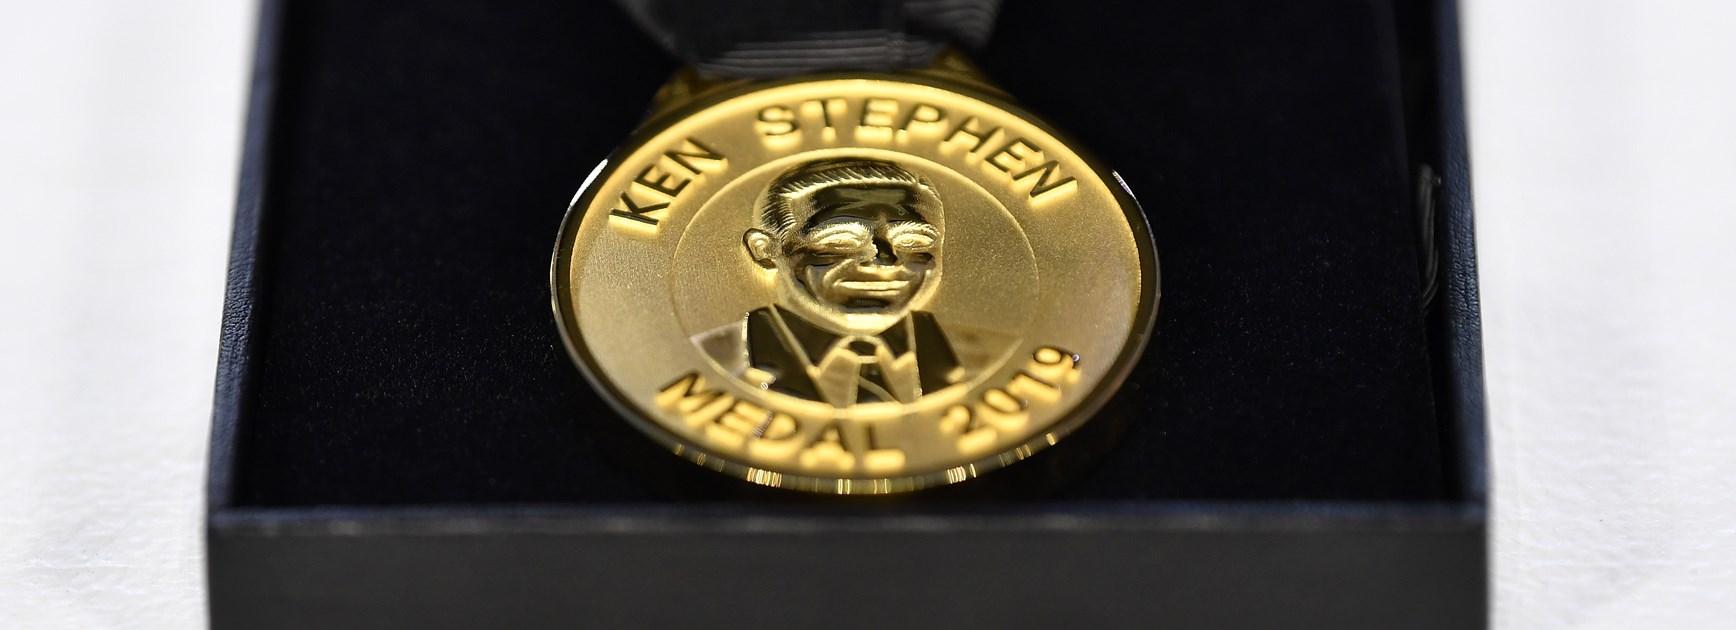 Ken Stephen Medal nominees announced